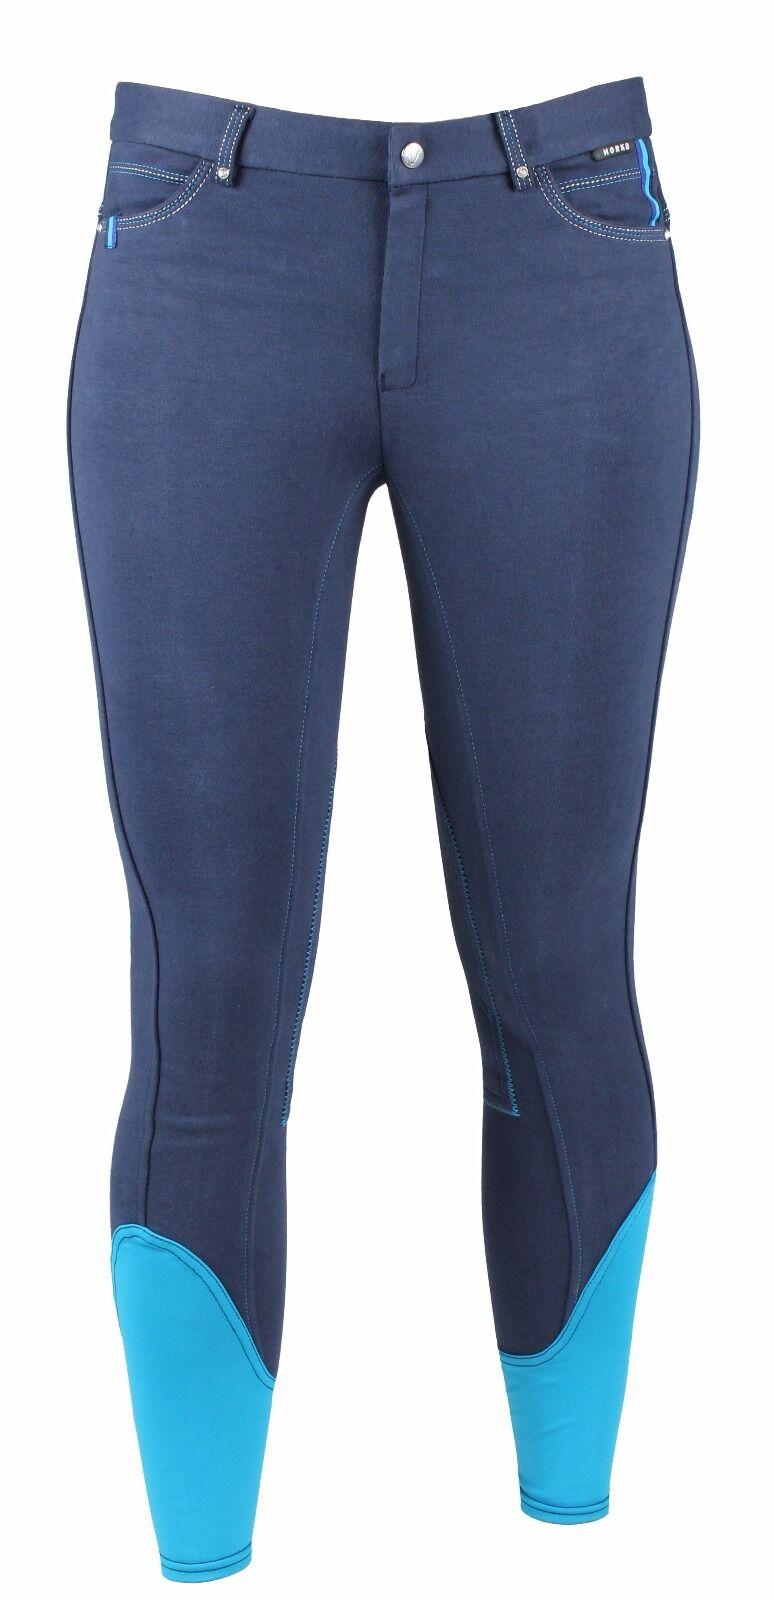 Horka Torino Elasta Breeches - bluee Turquoise Size 16